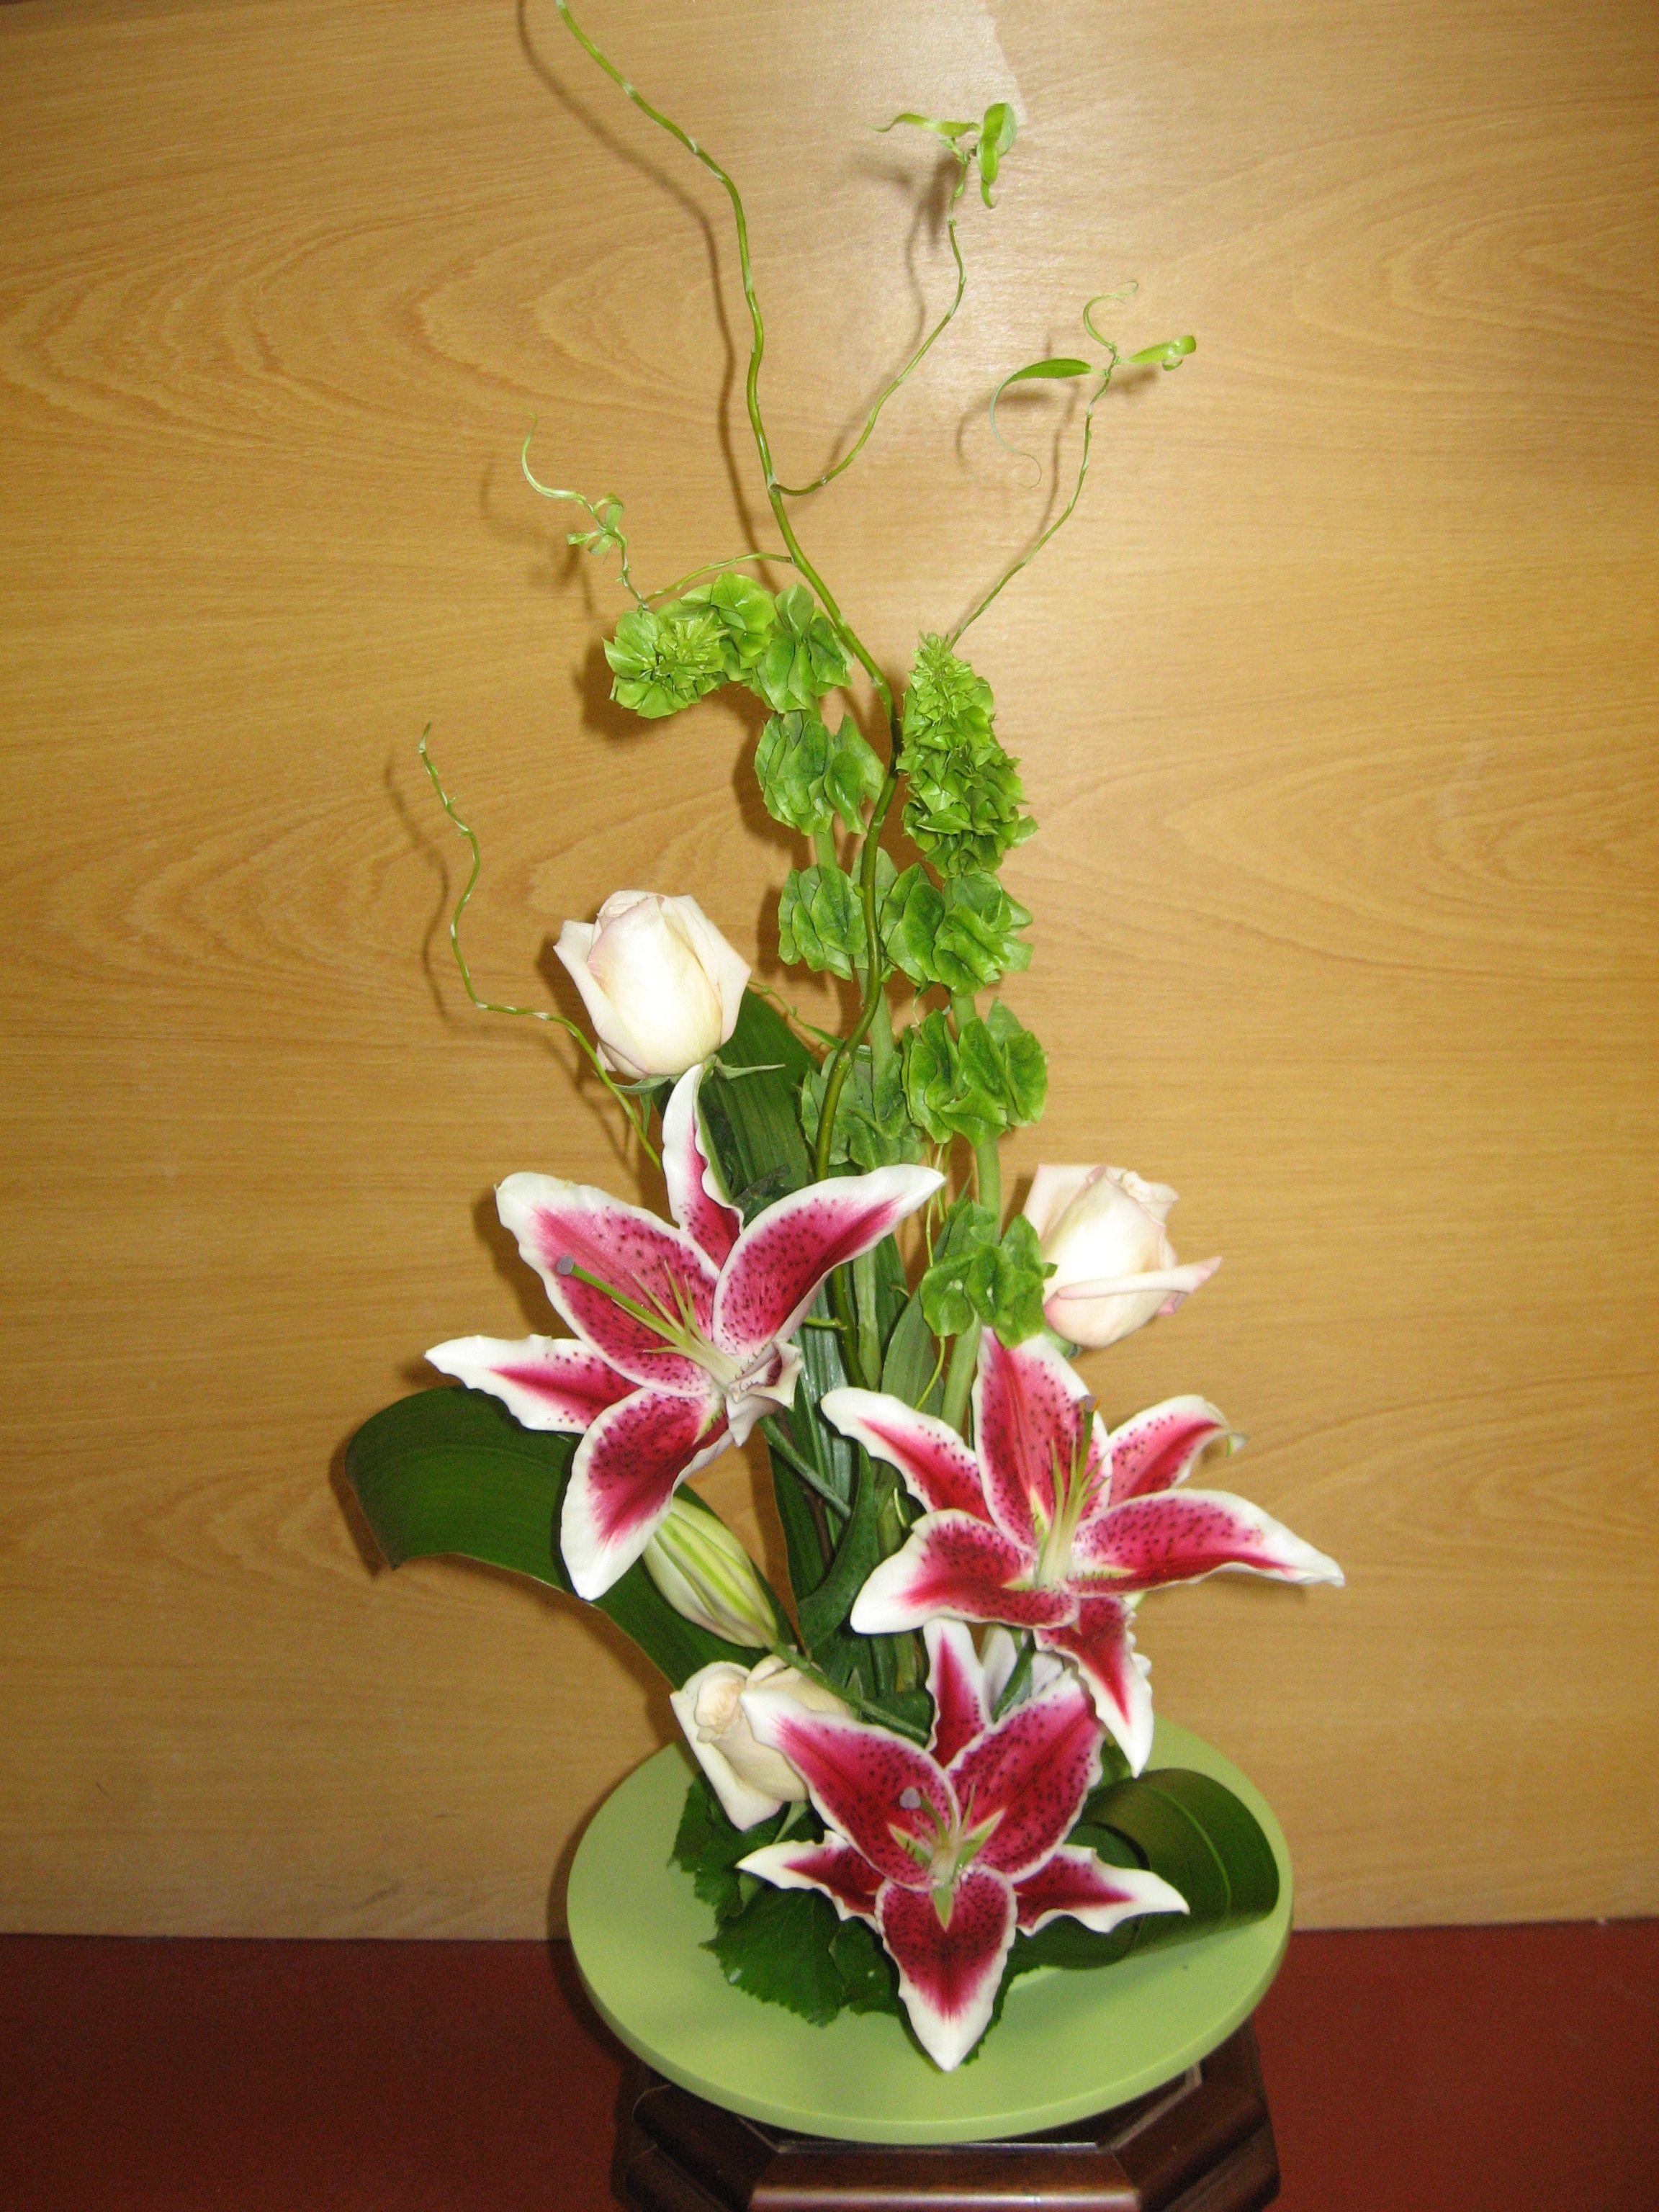 Japanese floral arrangements an intro to ikebana